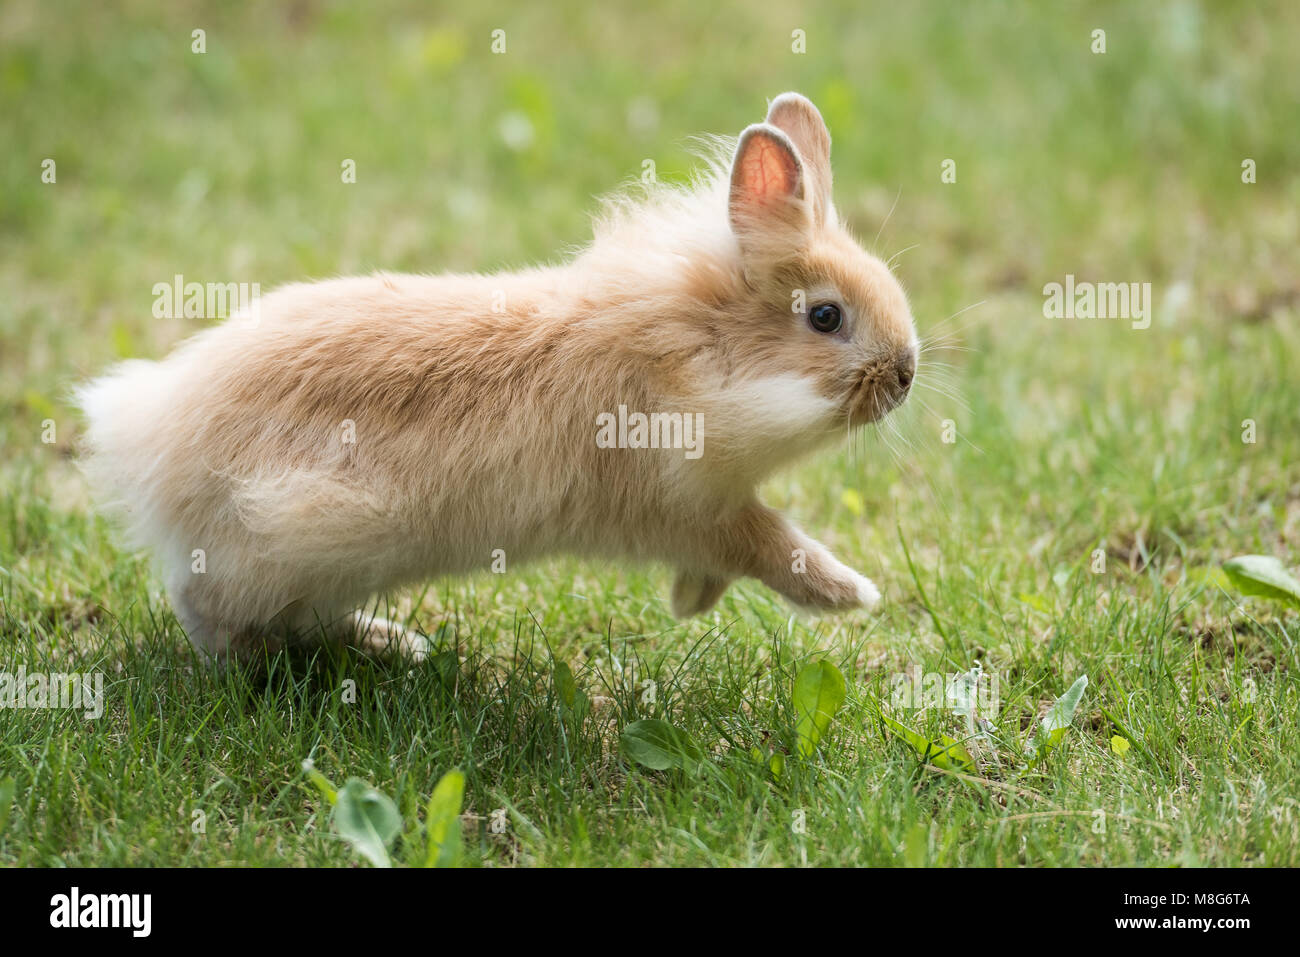 Baby Lionhead Rabbit (Bunny) runs on grass Stock Photo